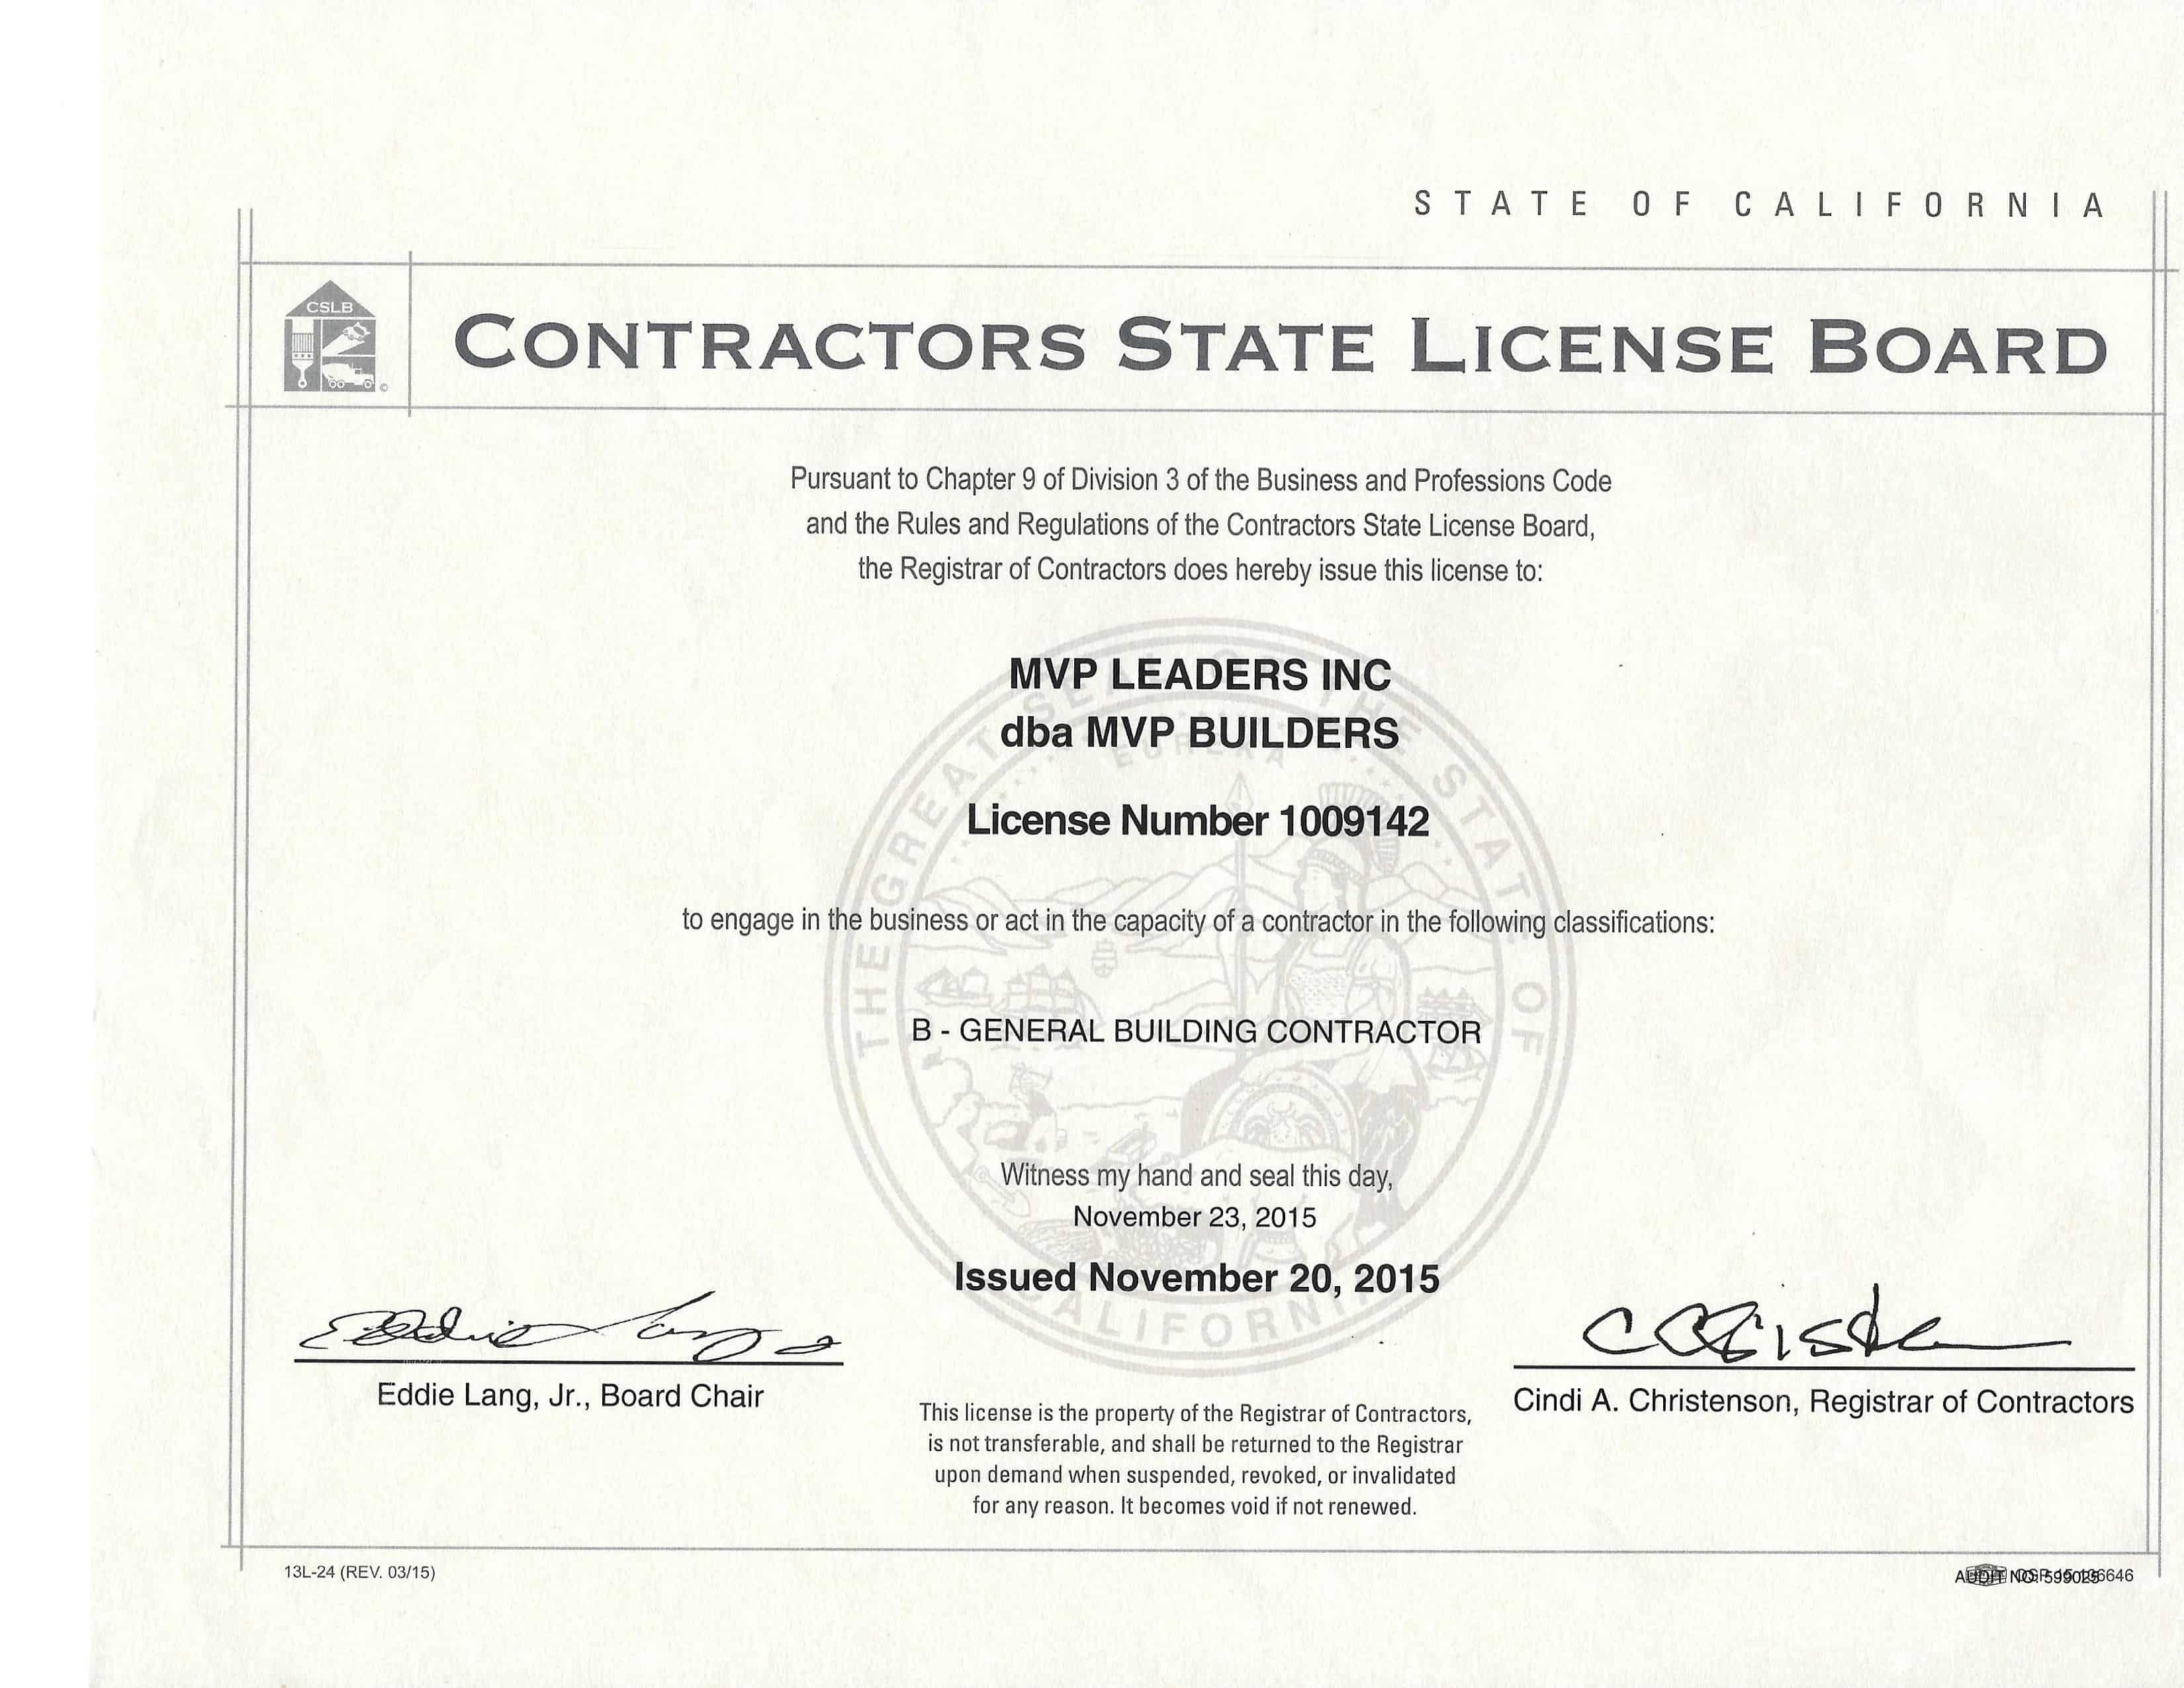 MVP BUILDERS – California Based Home Improvement Company